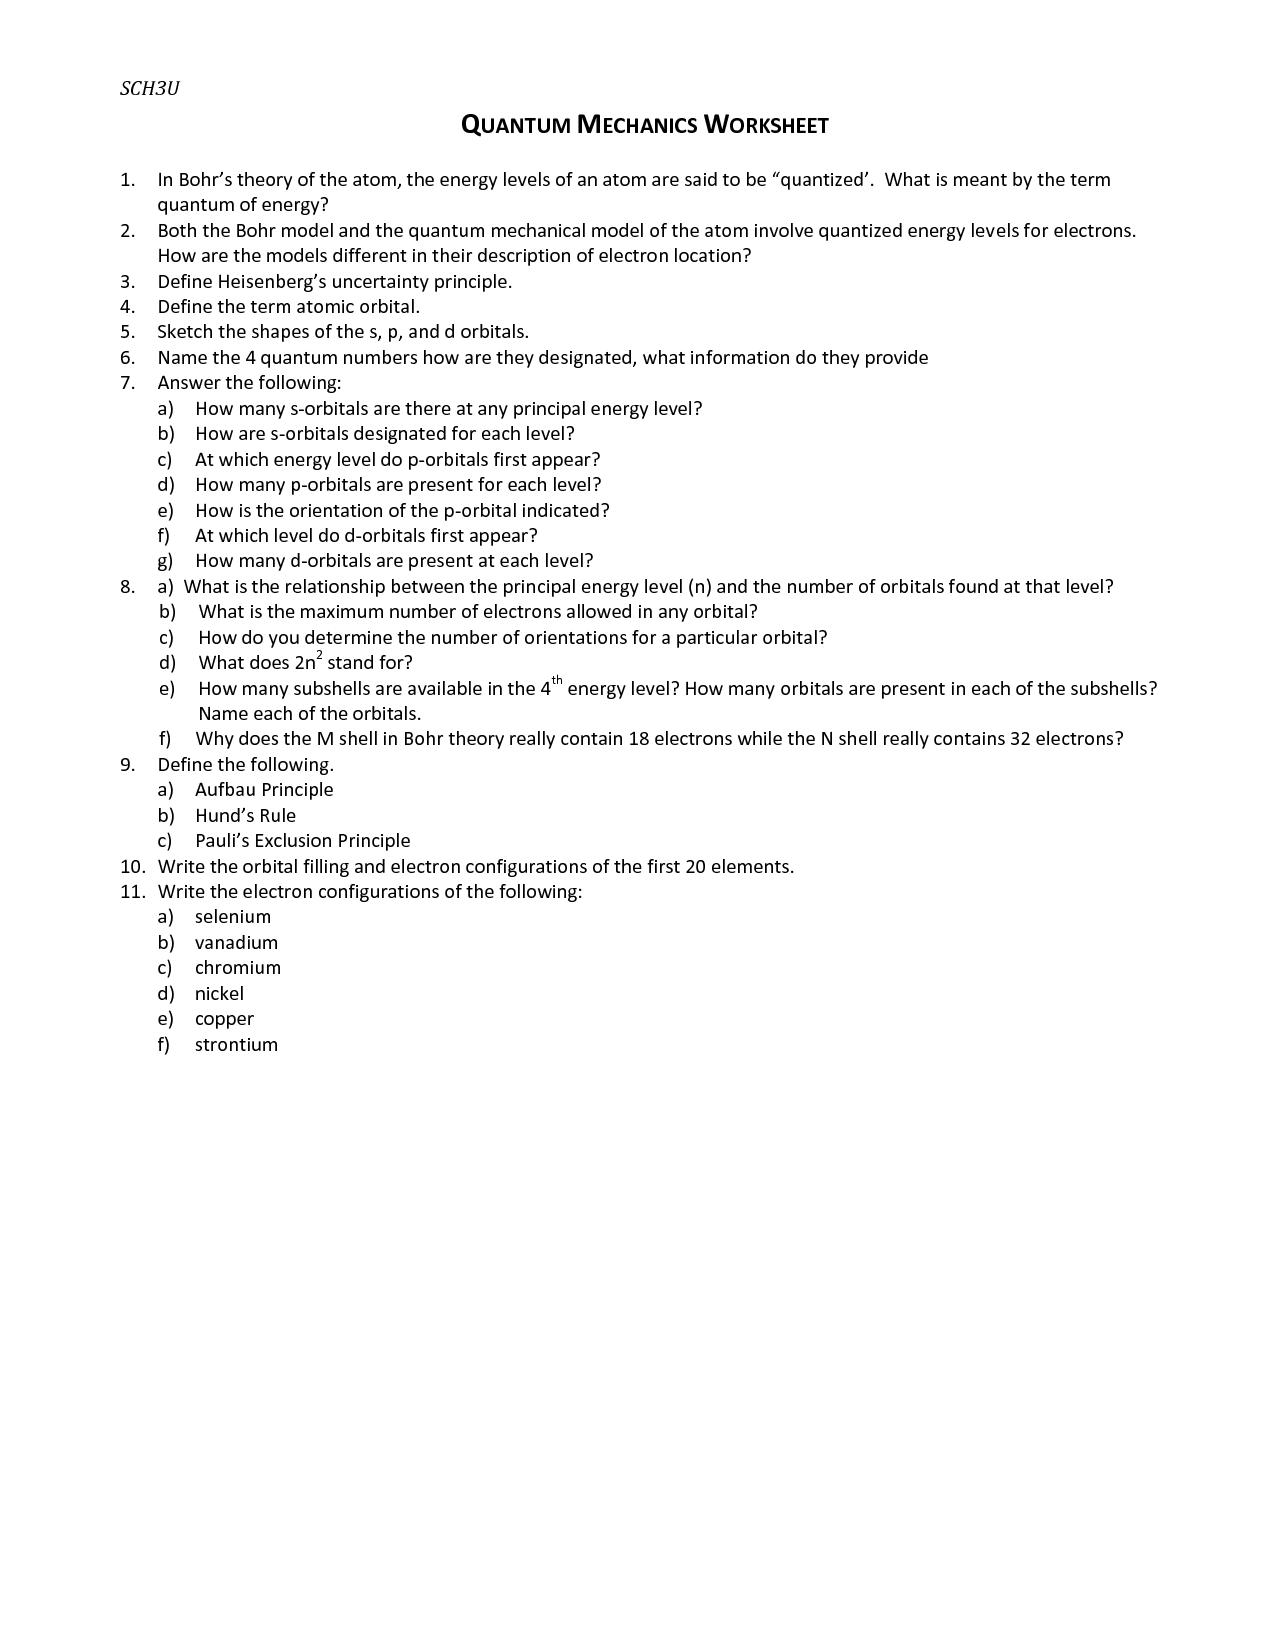 Quantum Mechanics Worksheet Beginner